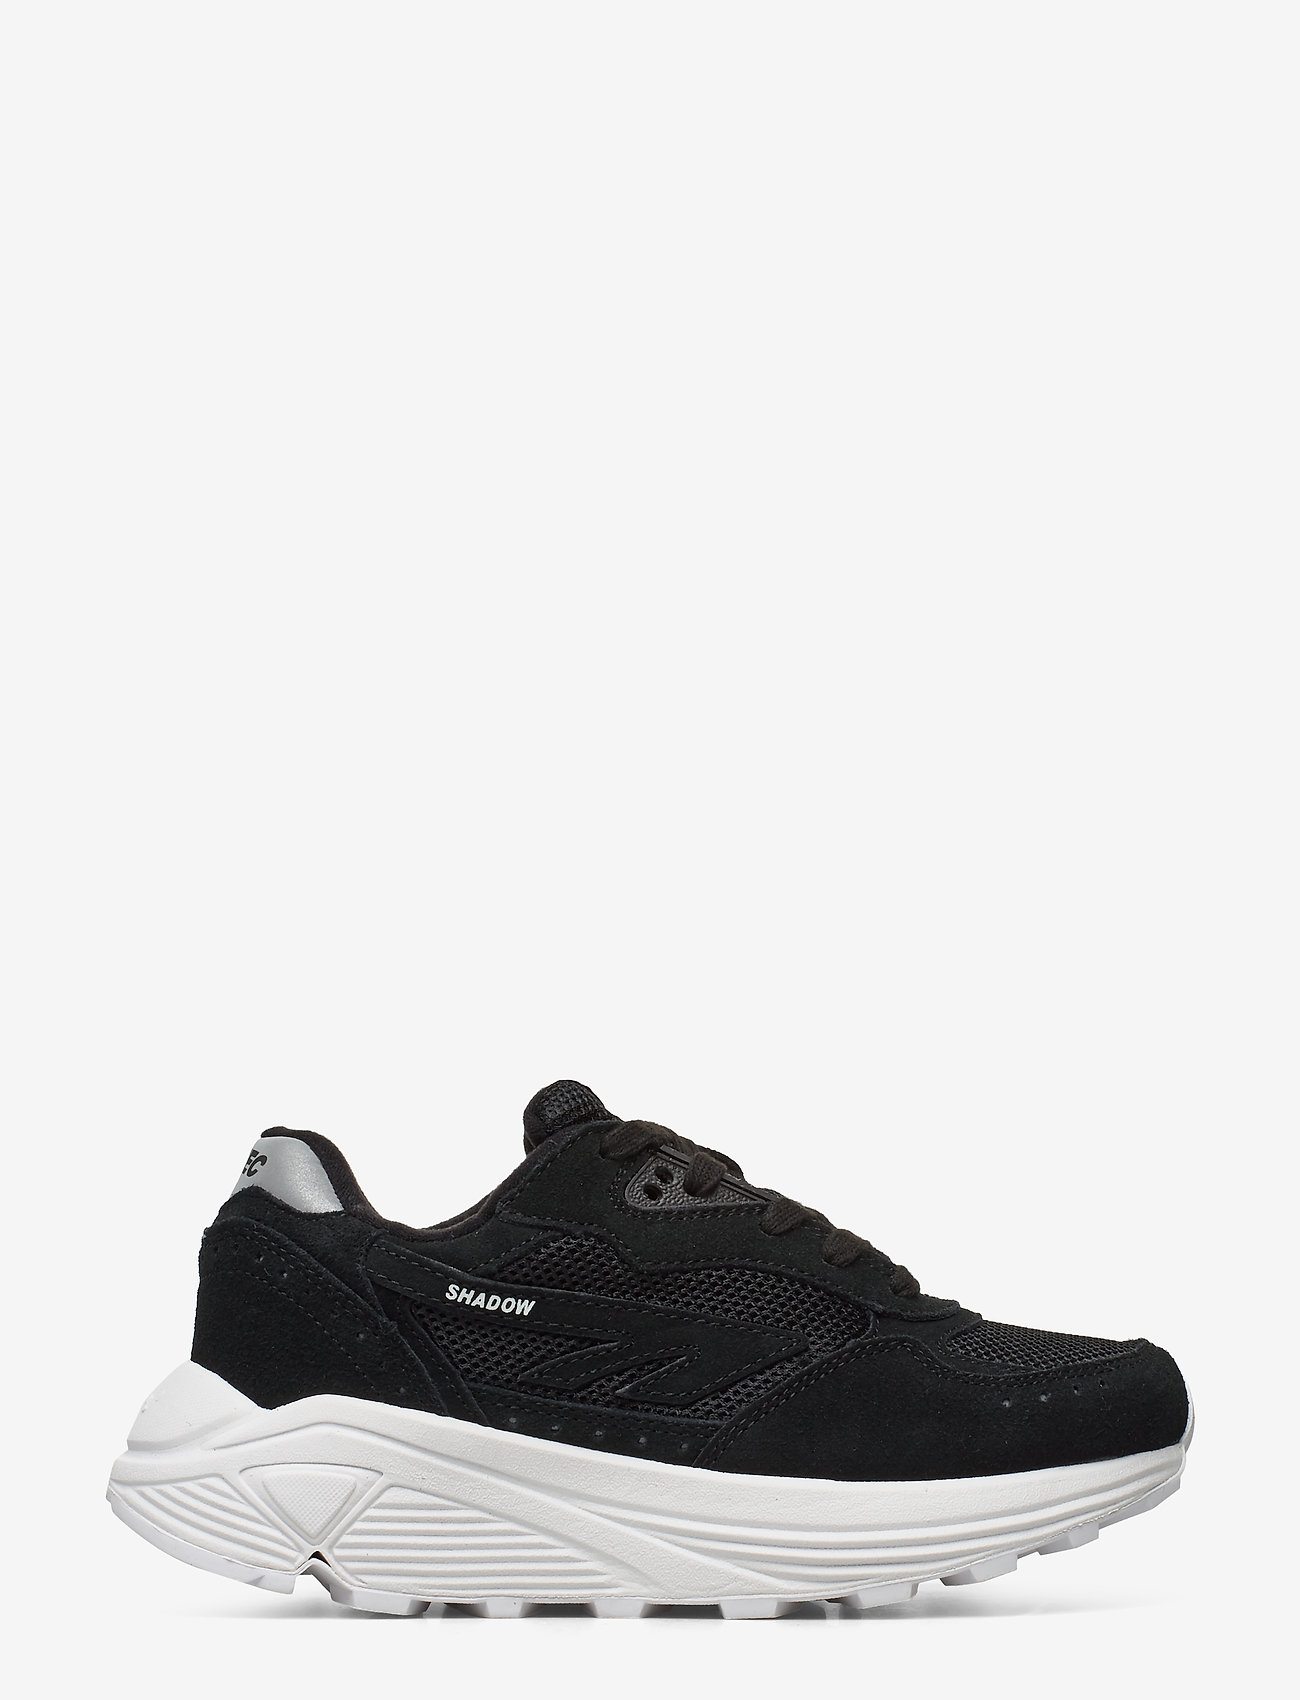 Hi-Tec - HT SHADOW RGS CORE SUEDE BLACK/WHITE - chunky sneakers - black/white - 1